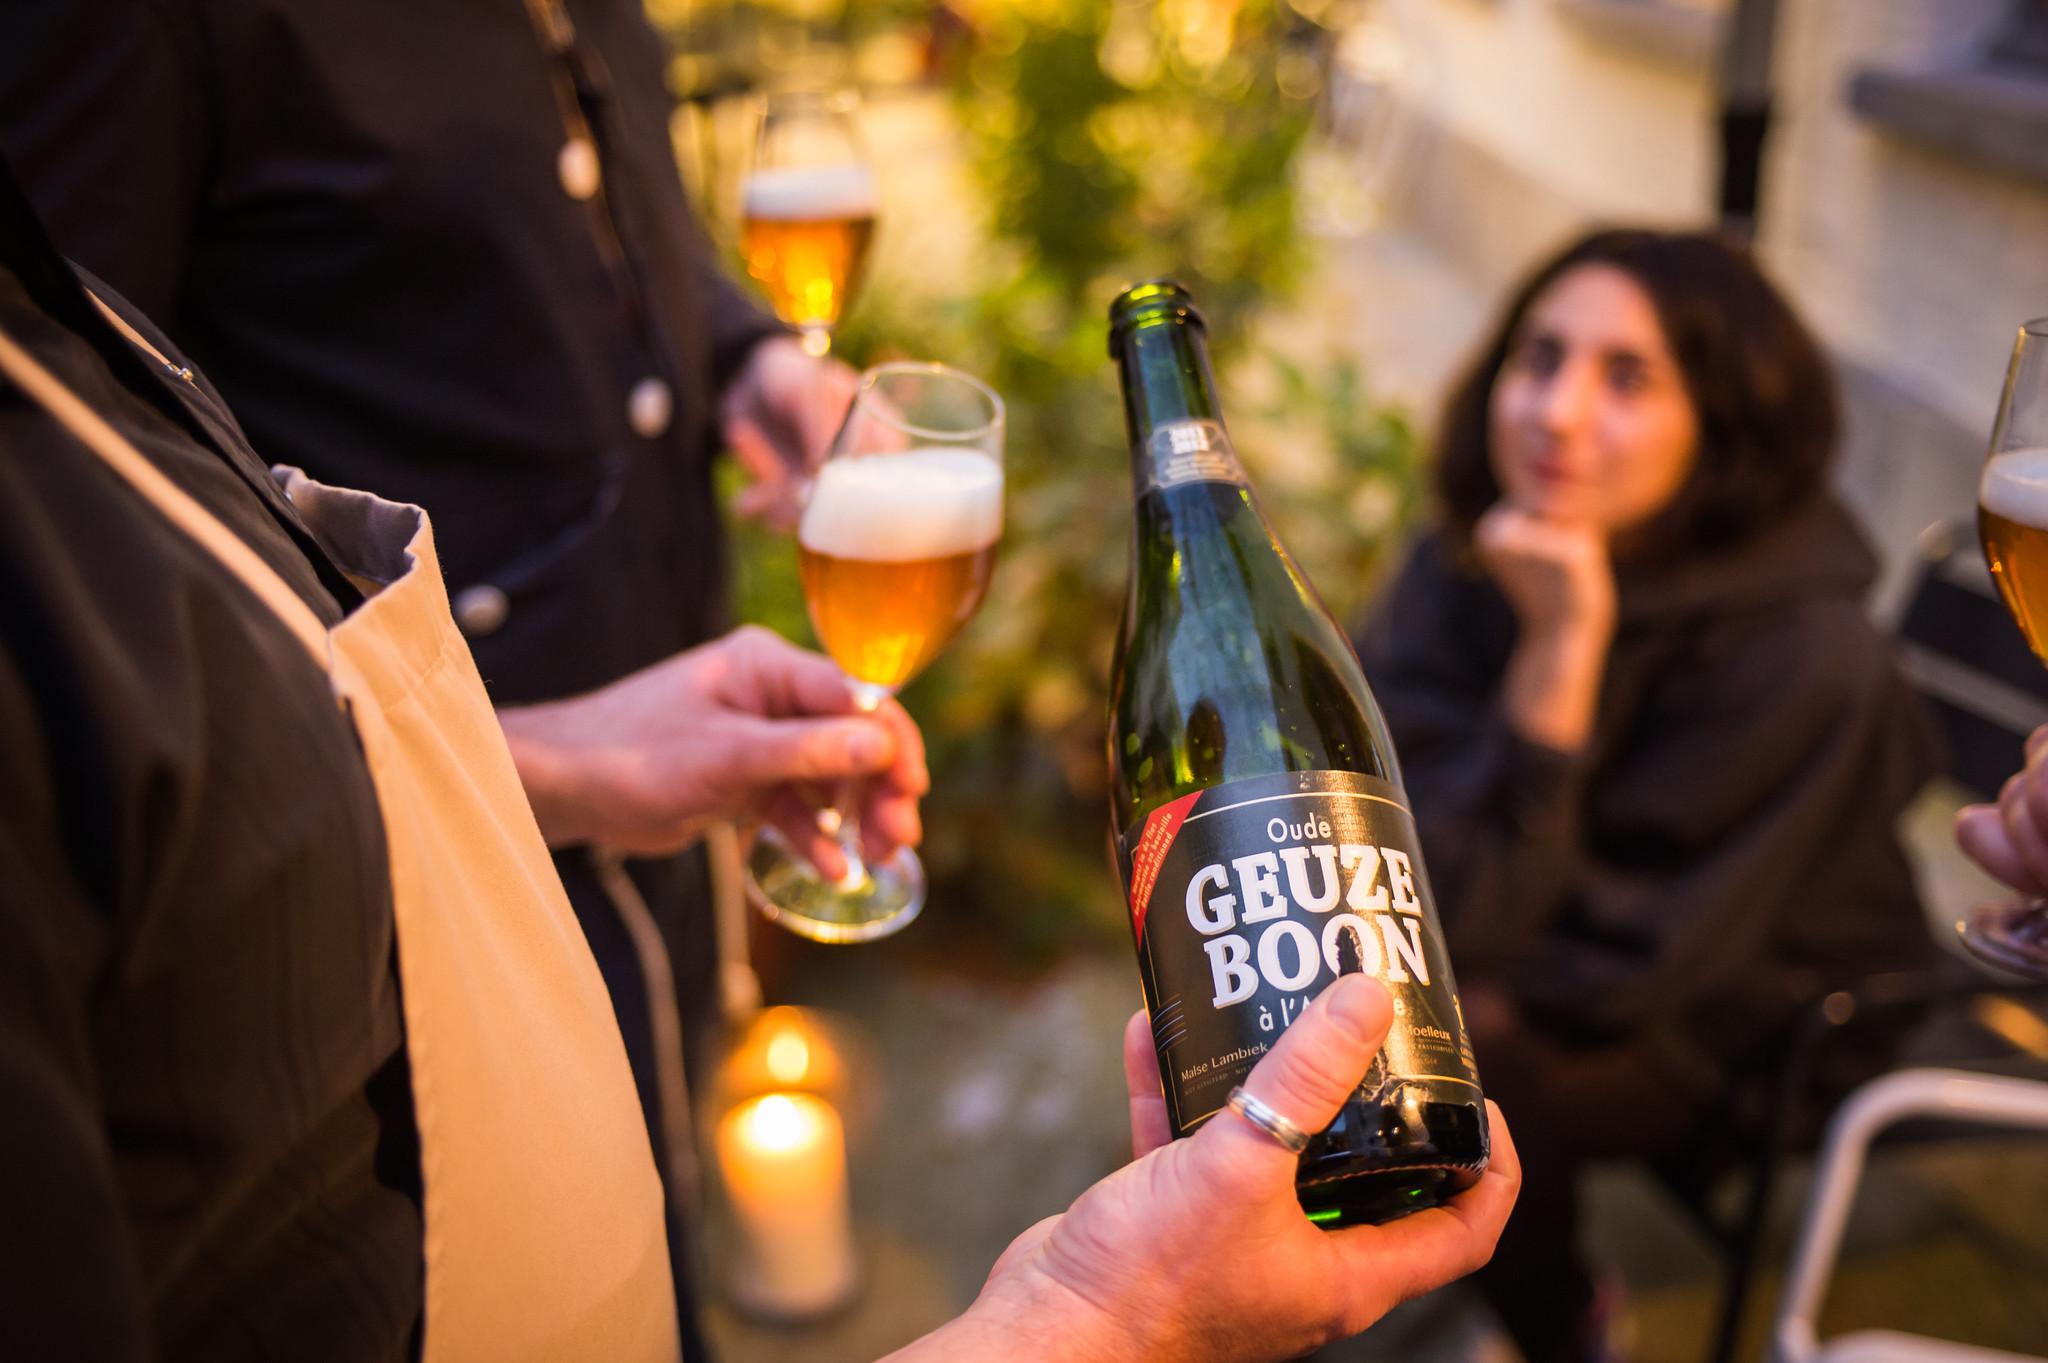 Las Cervezas belgas Lambics y Gueuzes